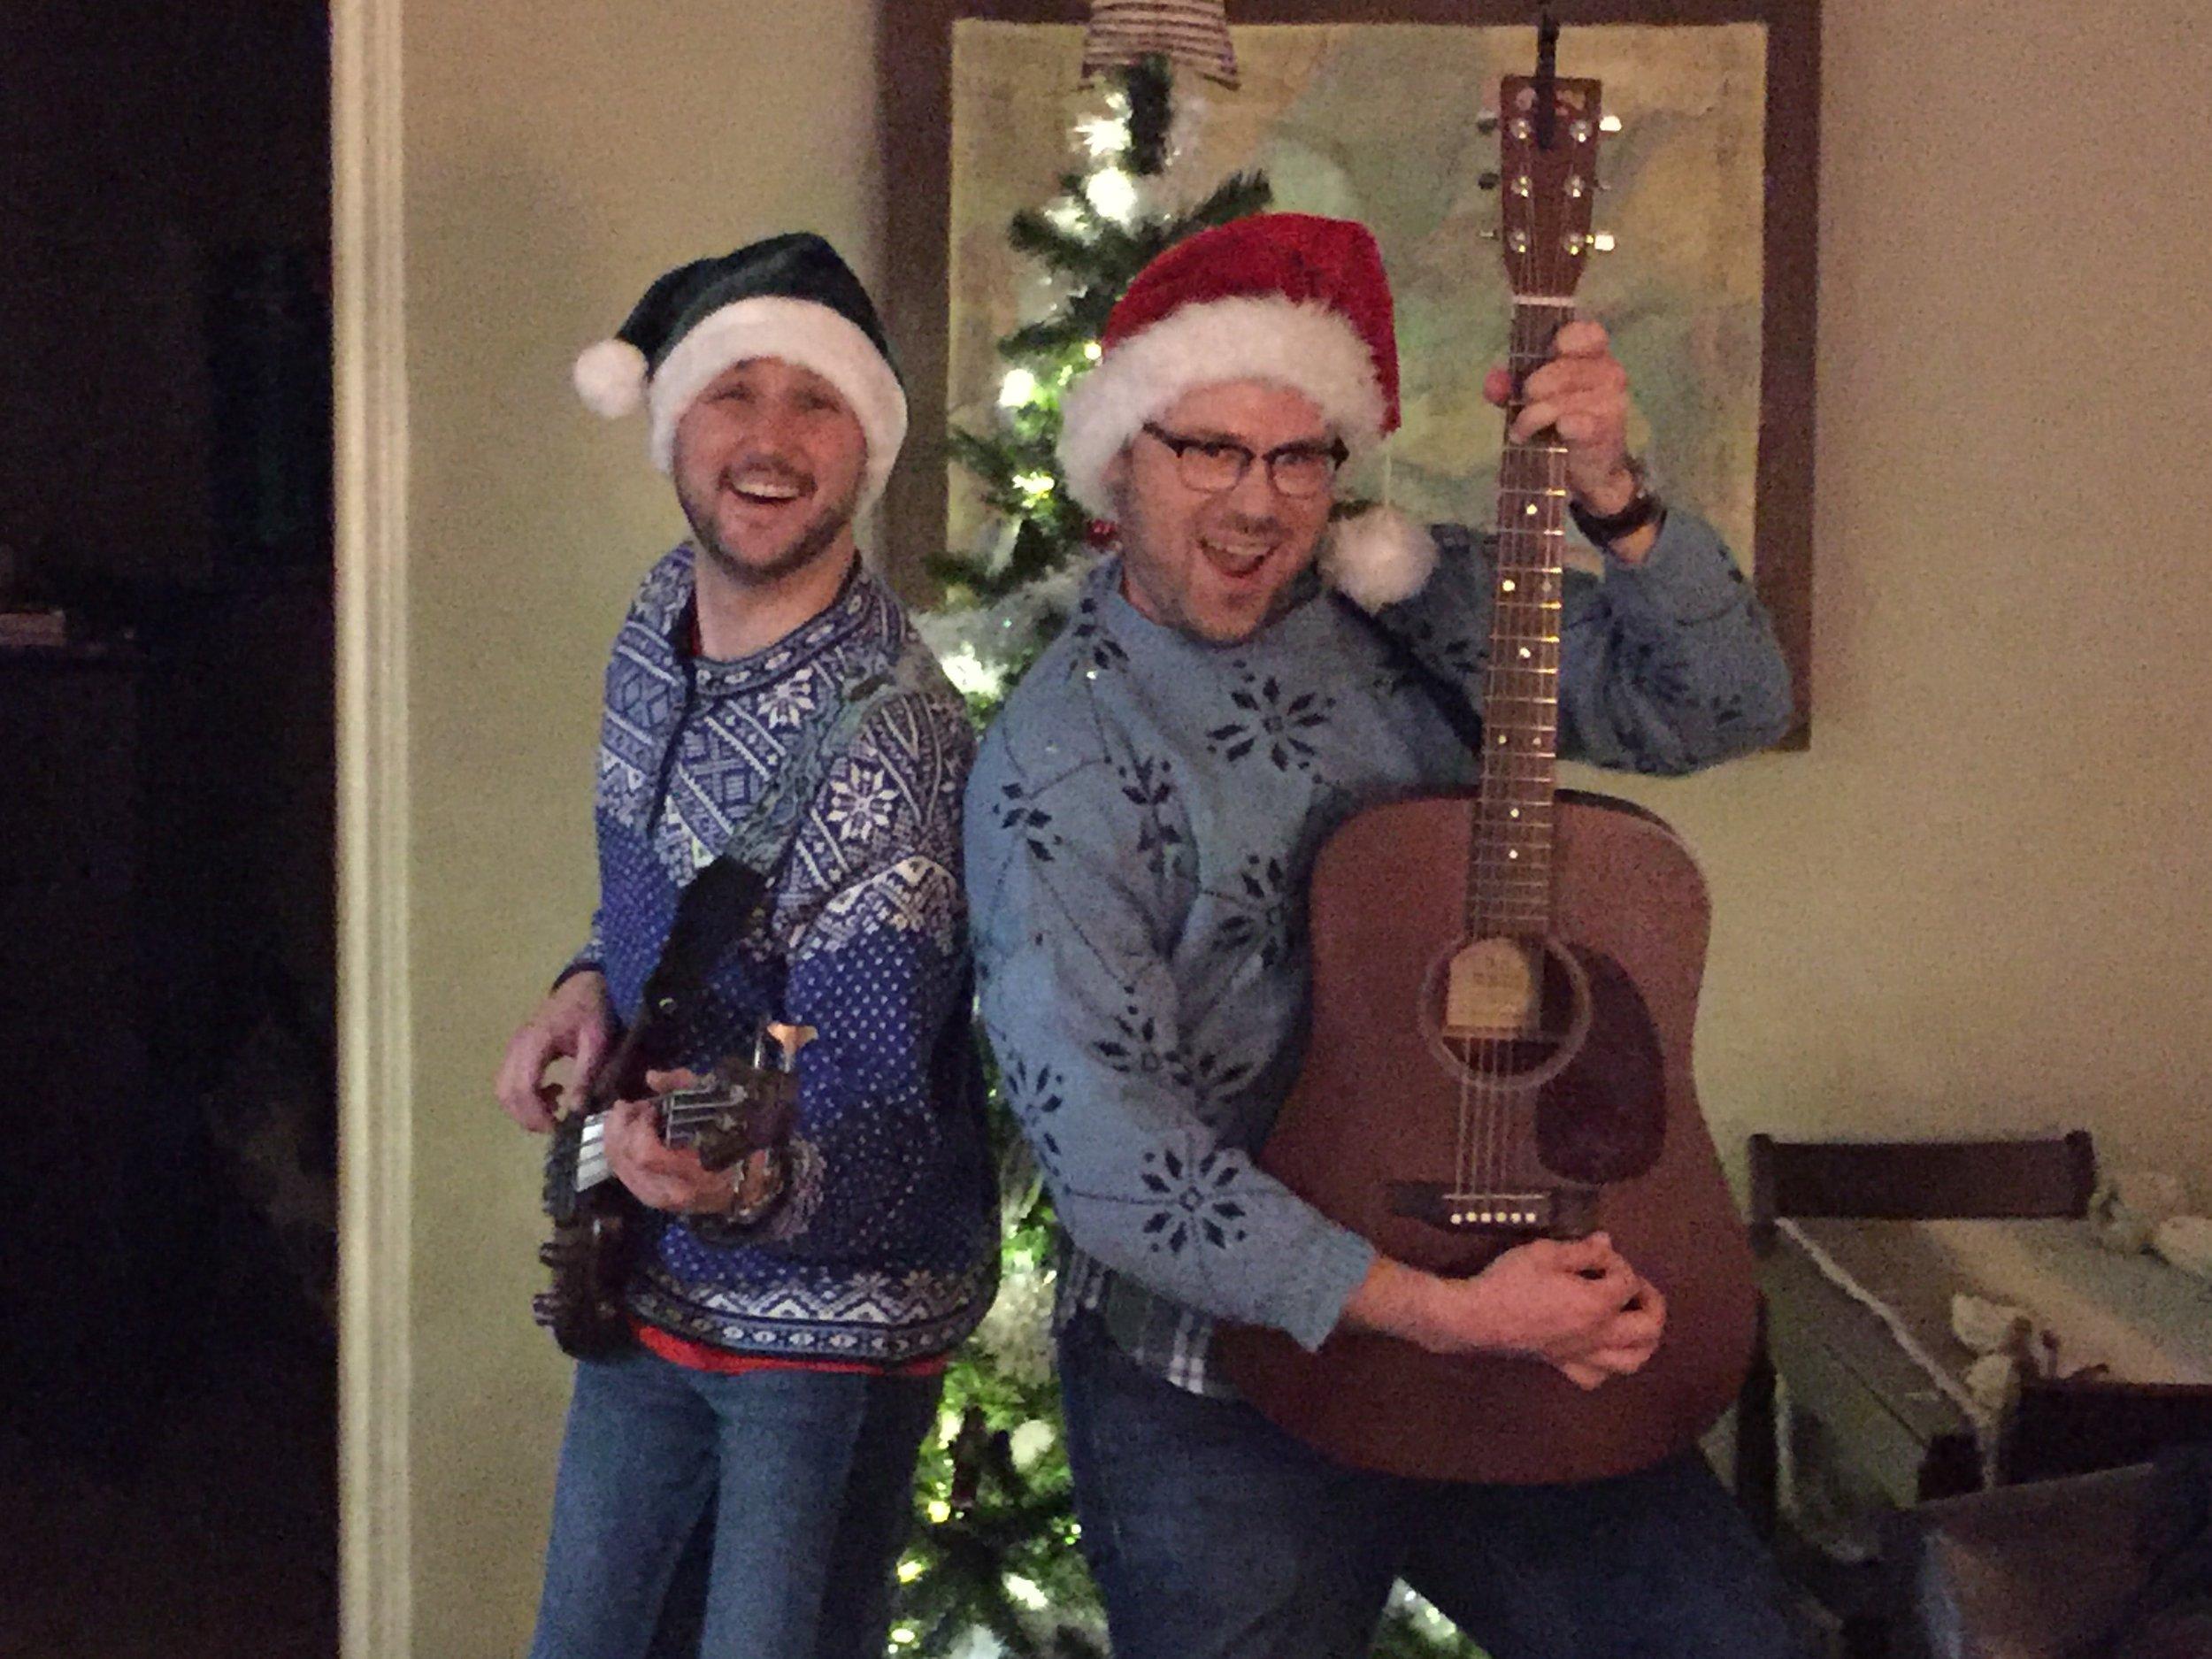 The Reindeer Games: San Antonio's Merriest Holiday Band